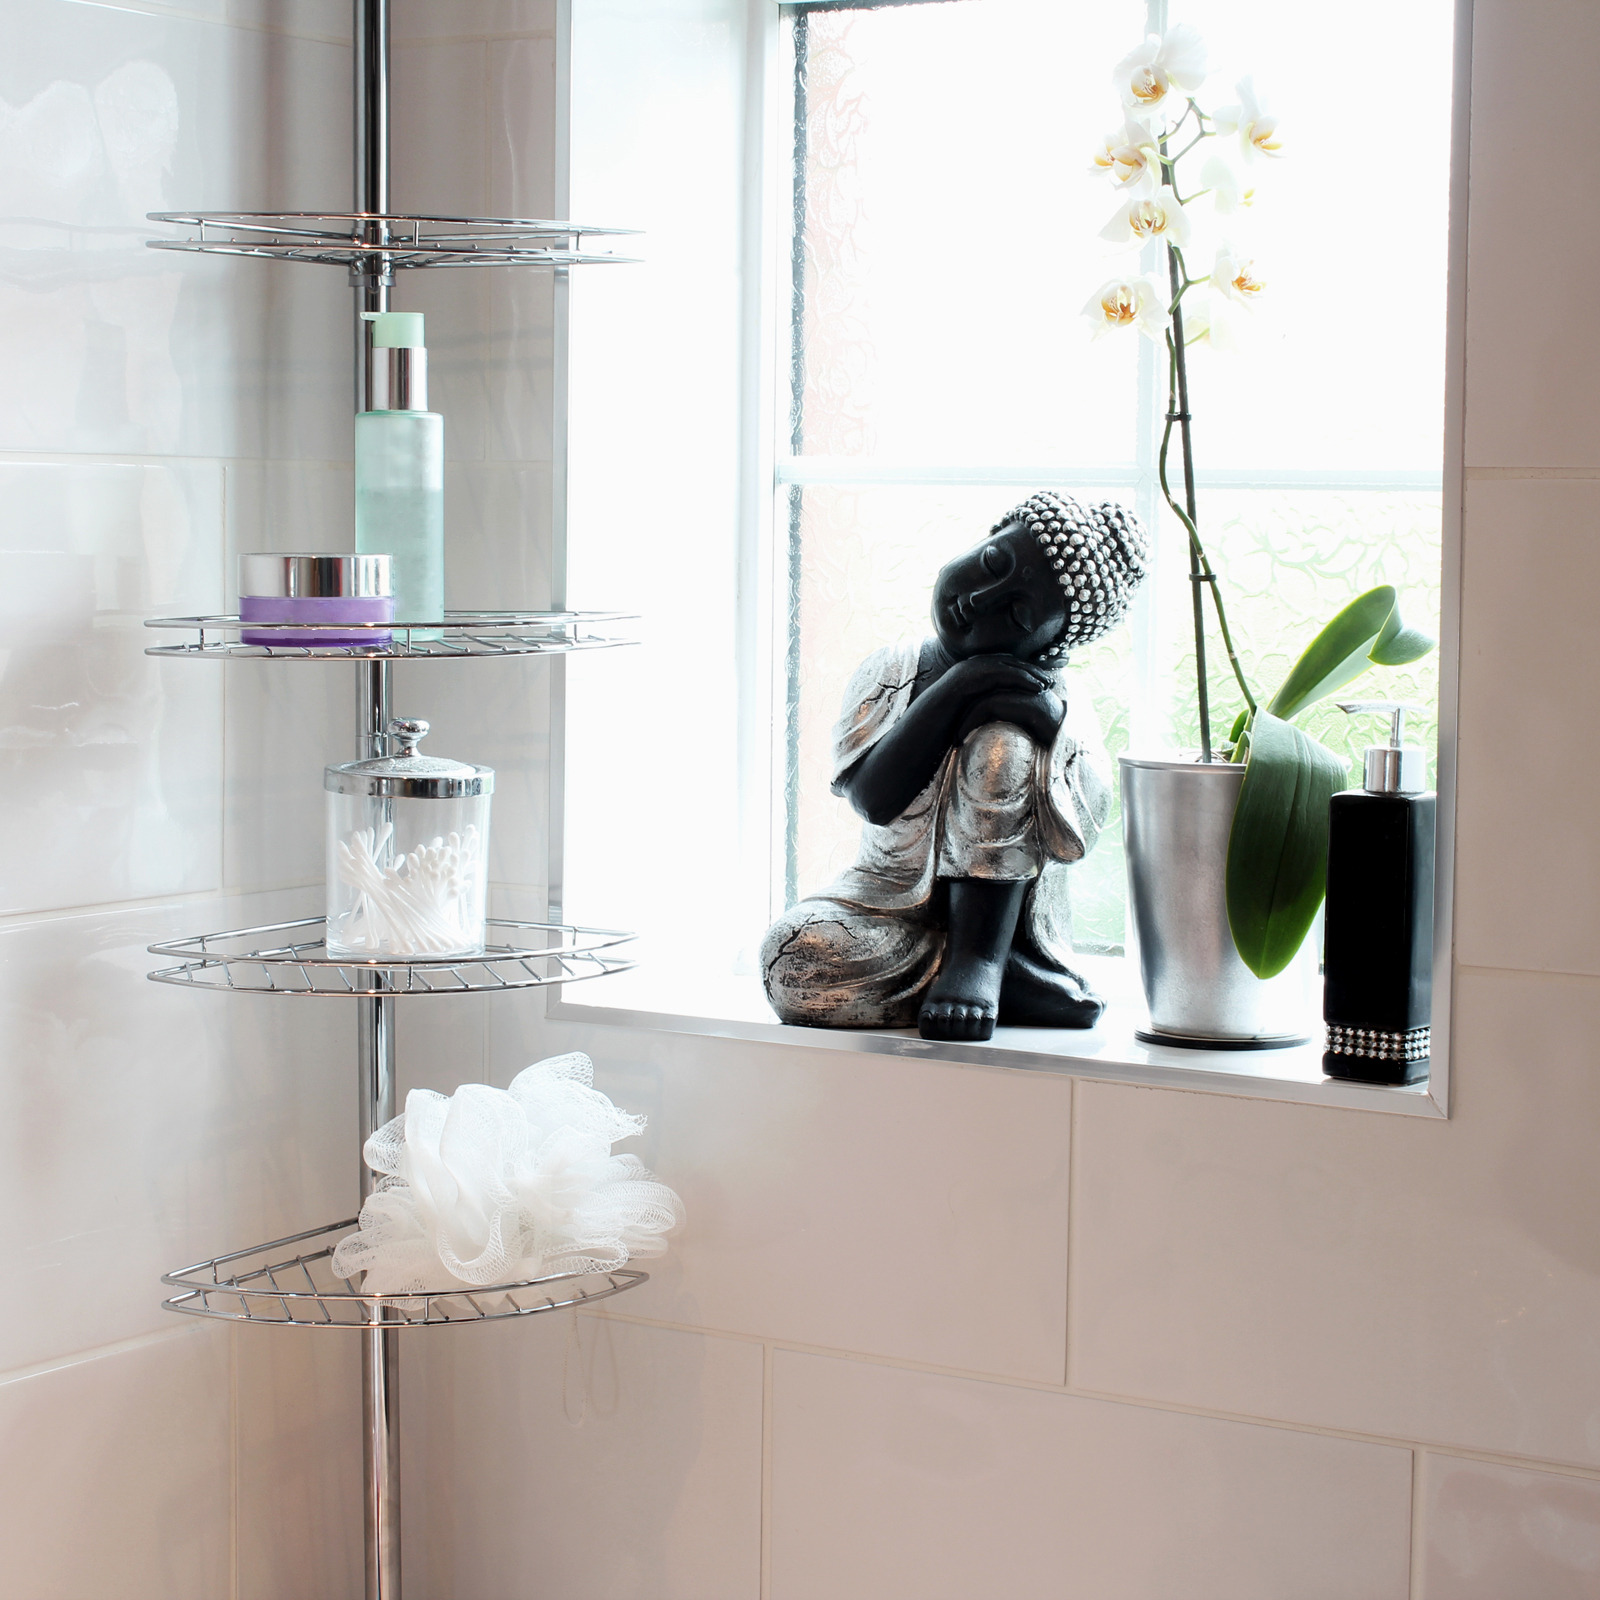 METAL CORNER SHOWER/BATHROOM TIDY BASKET CADDY/SHELF STORAGE SHELVES ...